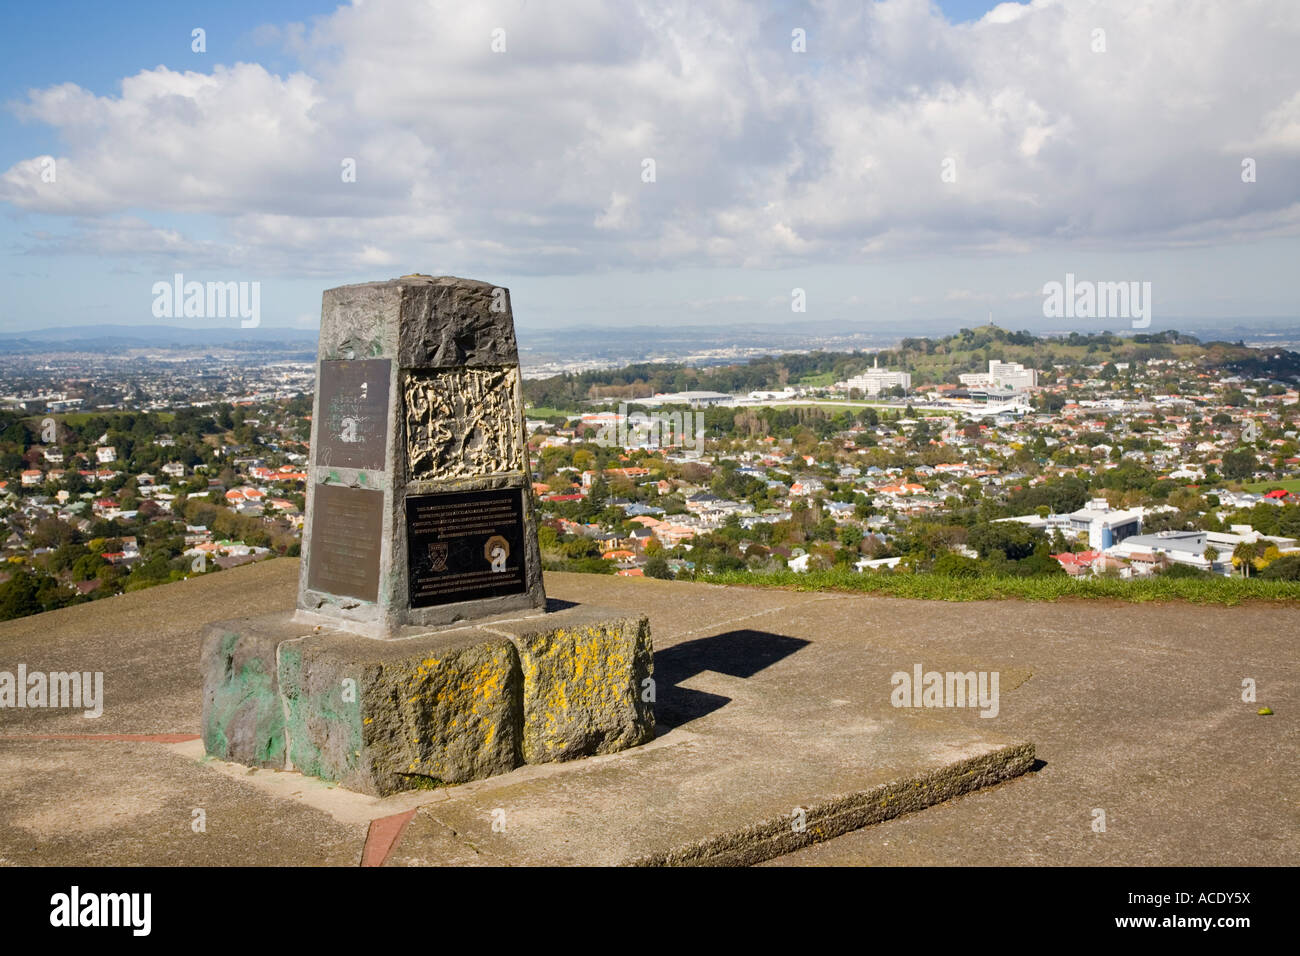 Mount Eden Domain Maungawhau Gipfel Stein Obelisk Denkmal am Aussichtspunkt auf ruhende Vulkankegel Auckland New Stockbild